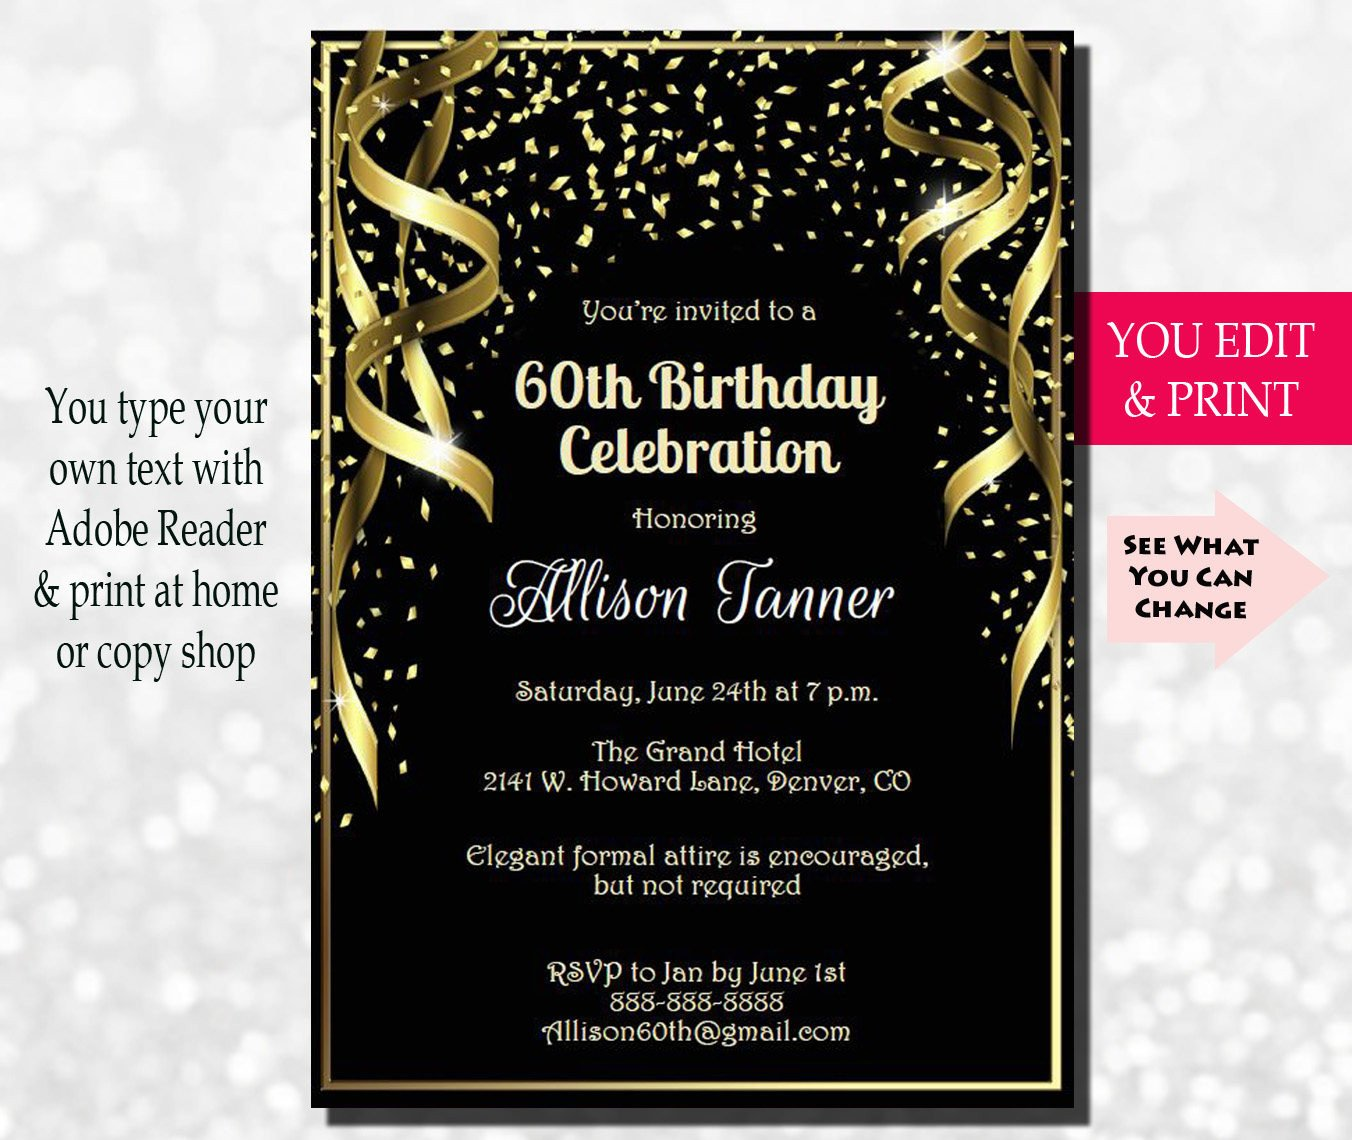 60 Th Birthday Invites 60th Birthday Invitation 60th Birthday Party Invitation 60th